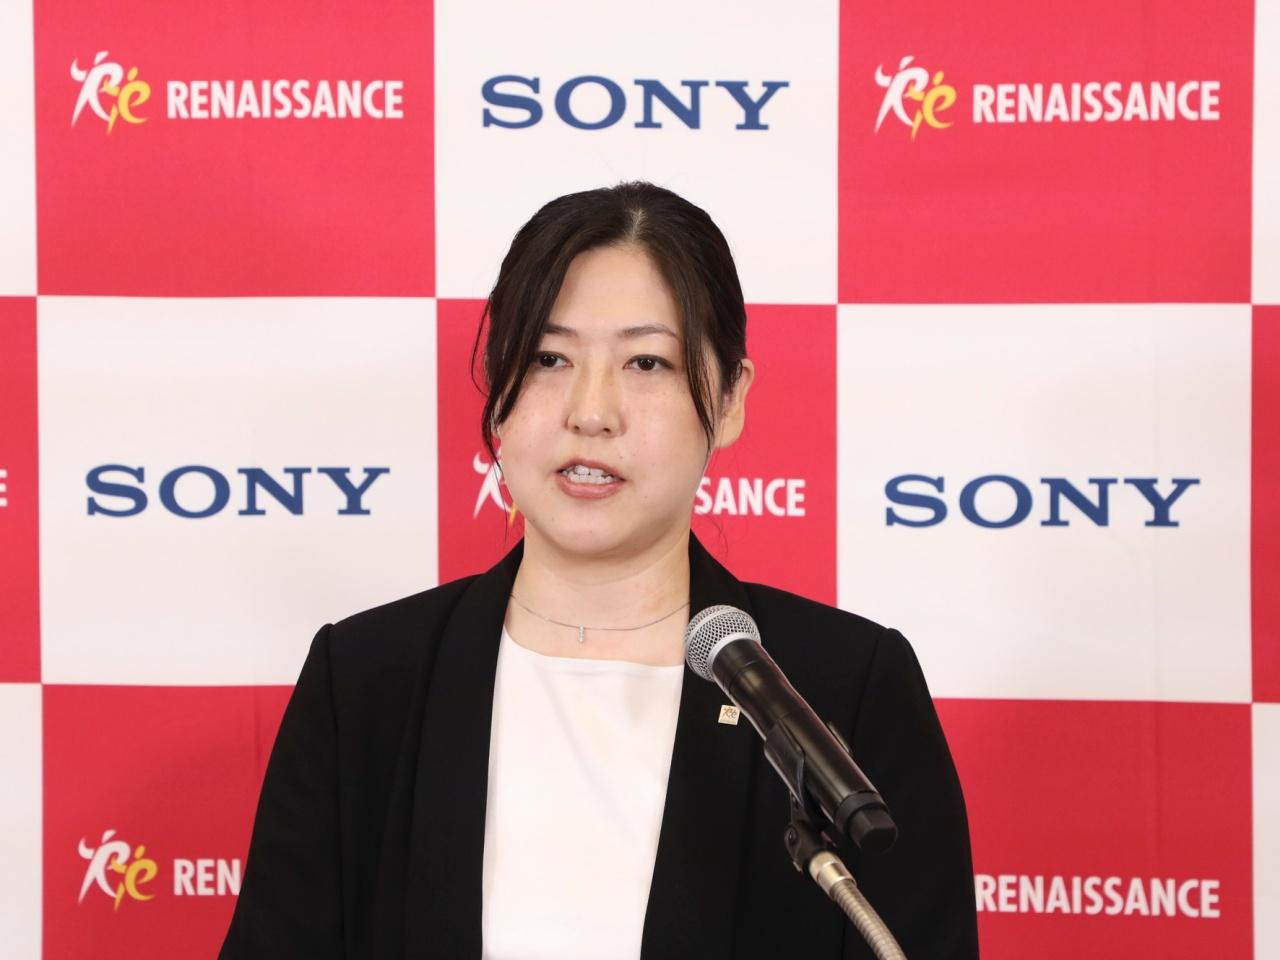 Sony Renaissance